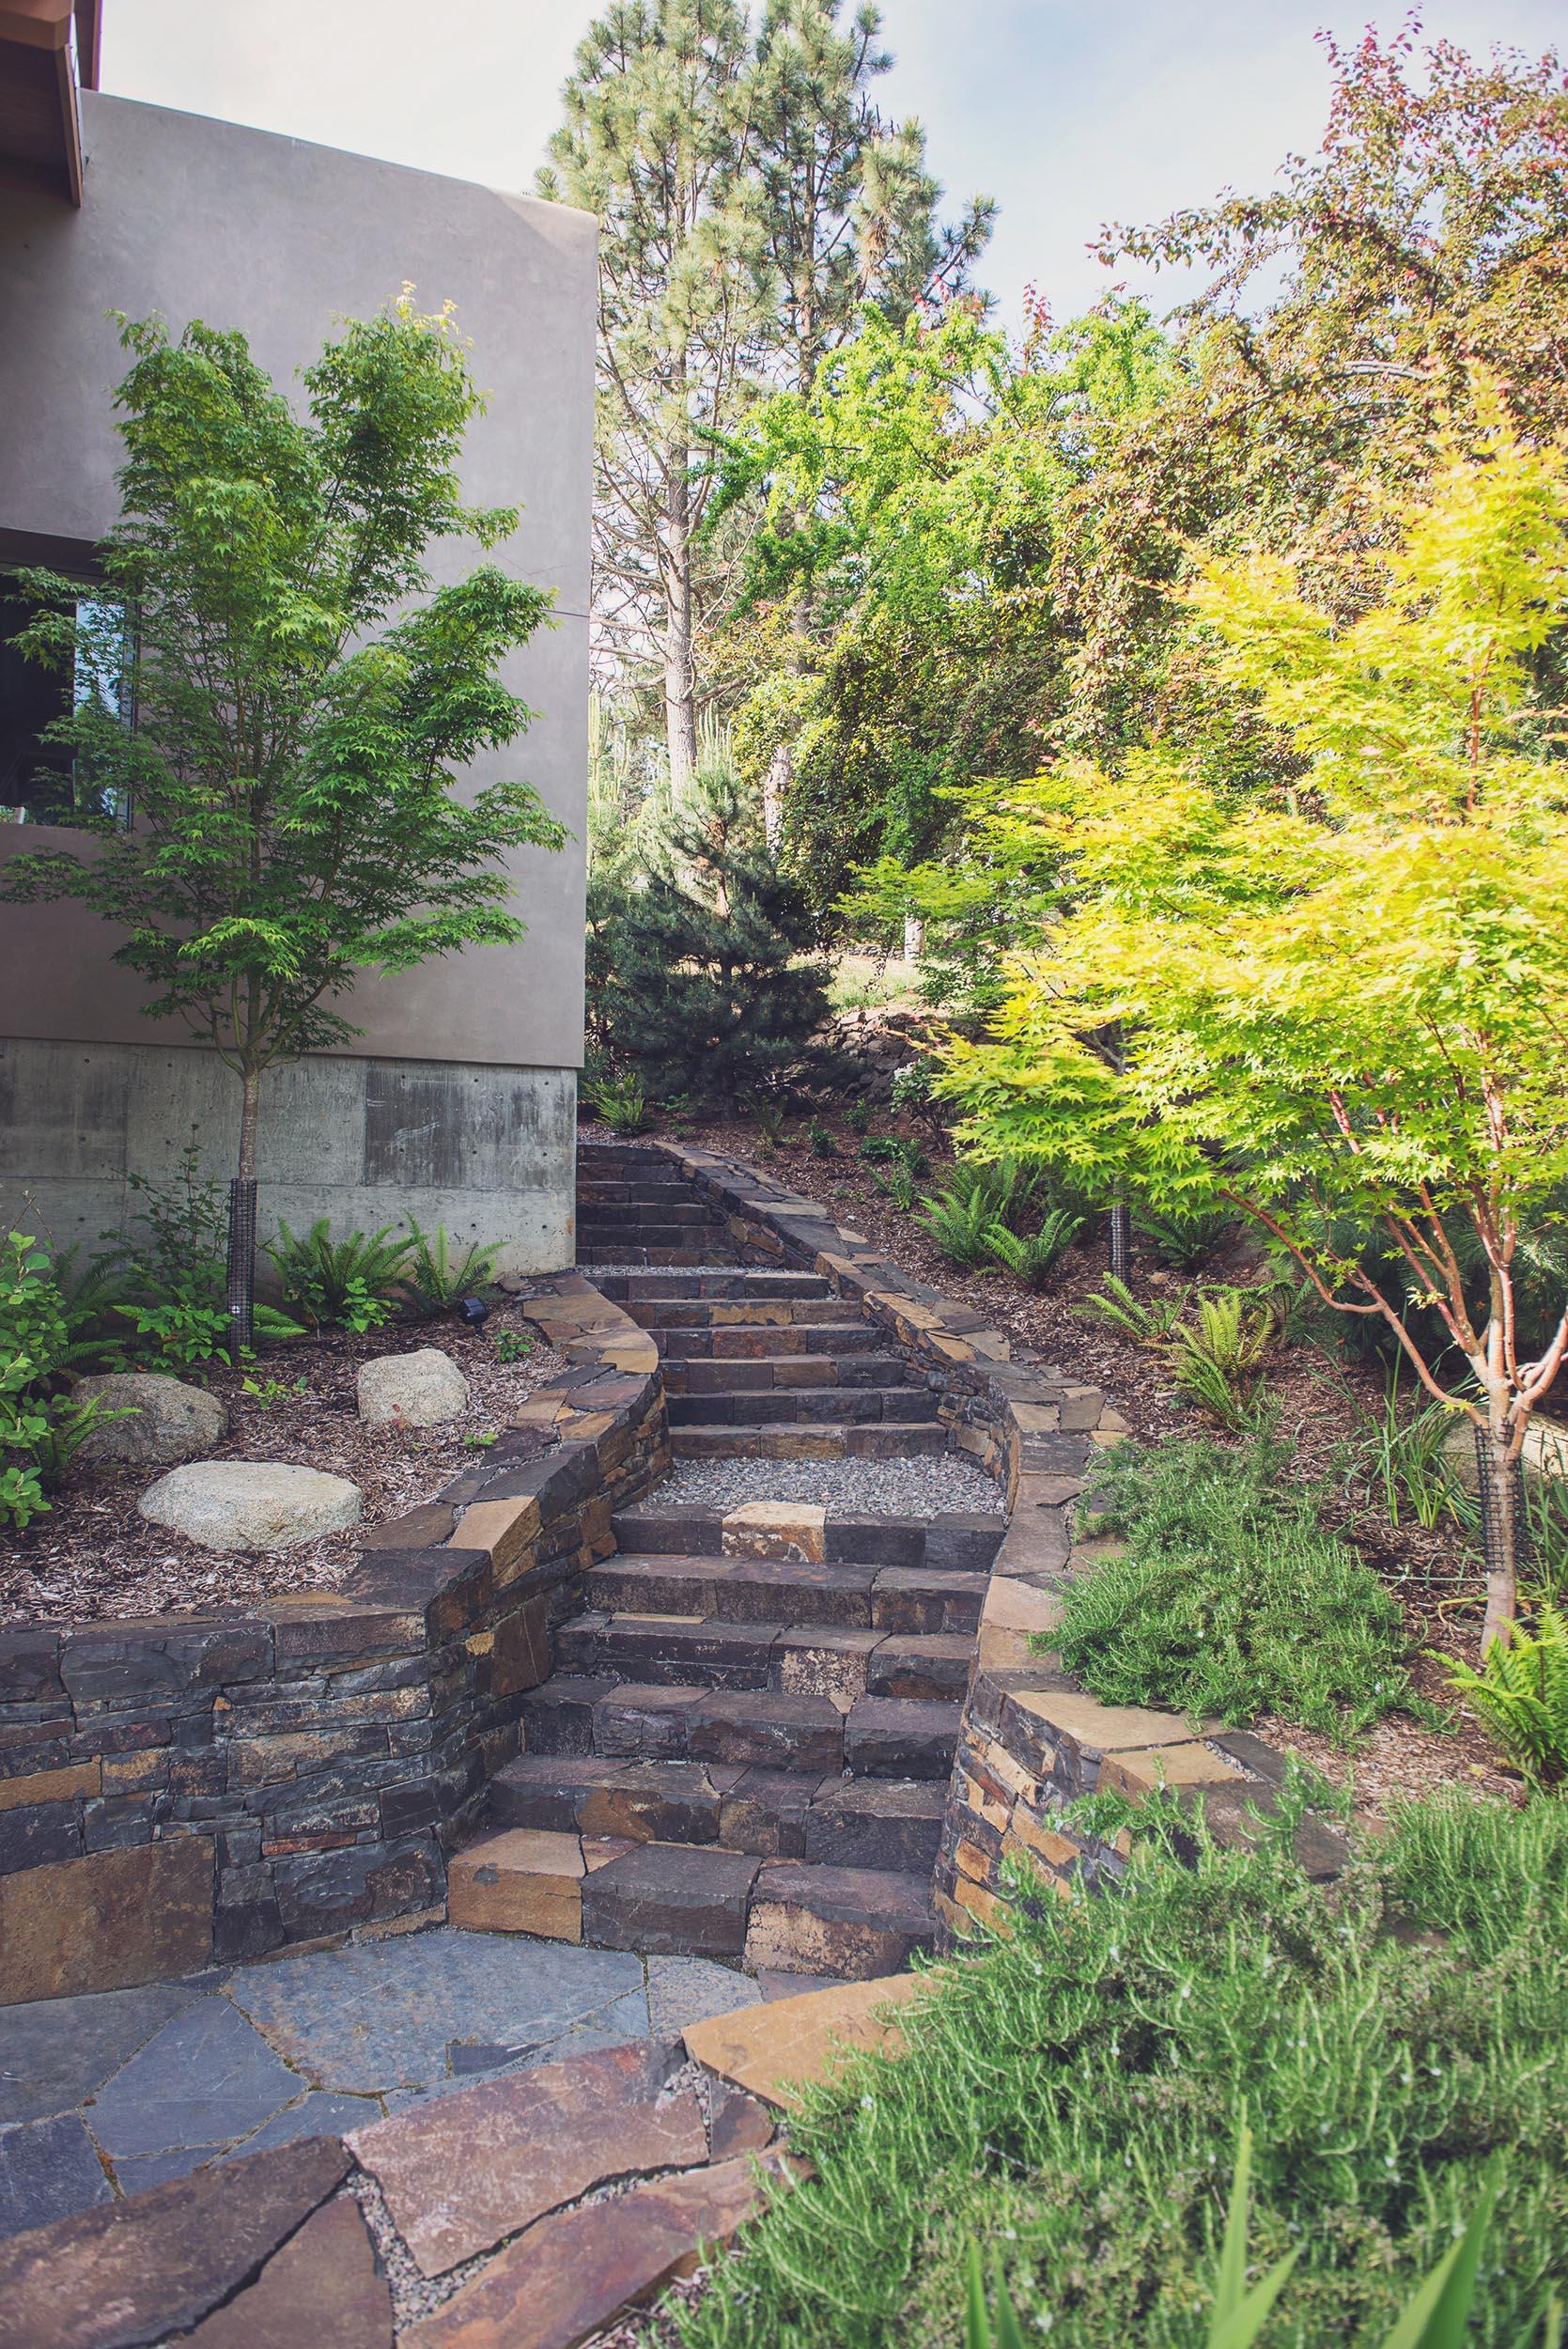 locally quarried stacked basalt stairs + flagstone patio + basalt retaining walls + modern landscape architecture + mountain maples + perennial gard